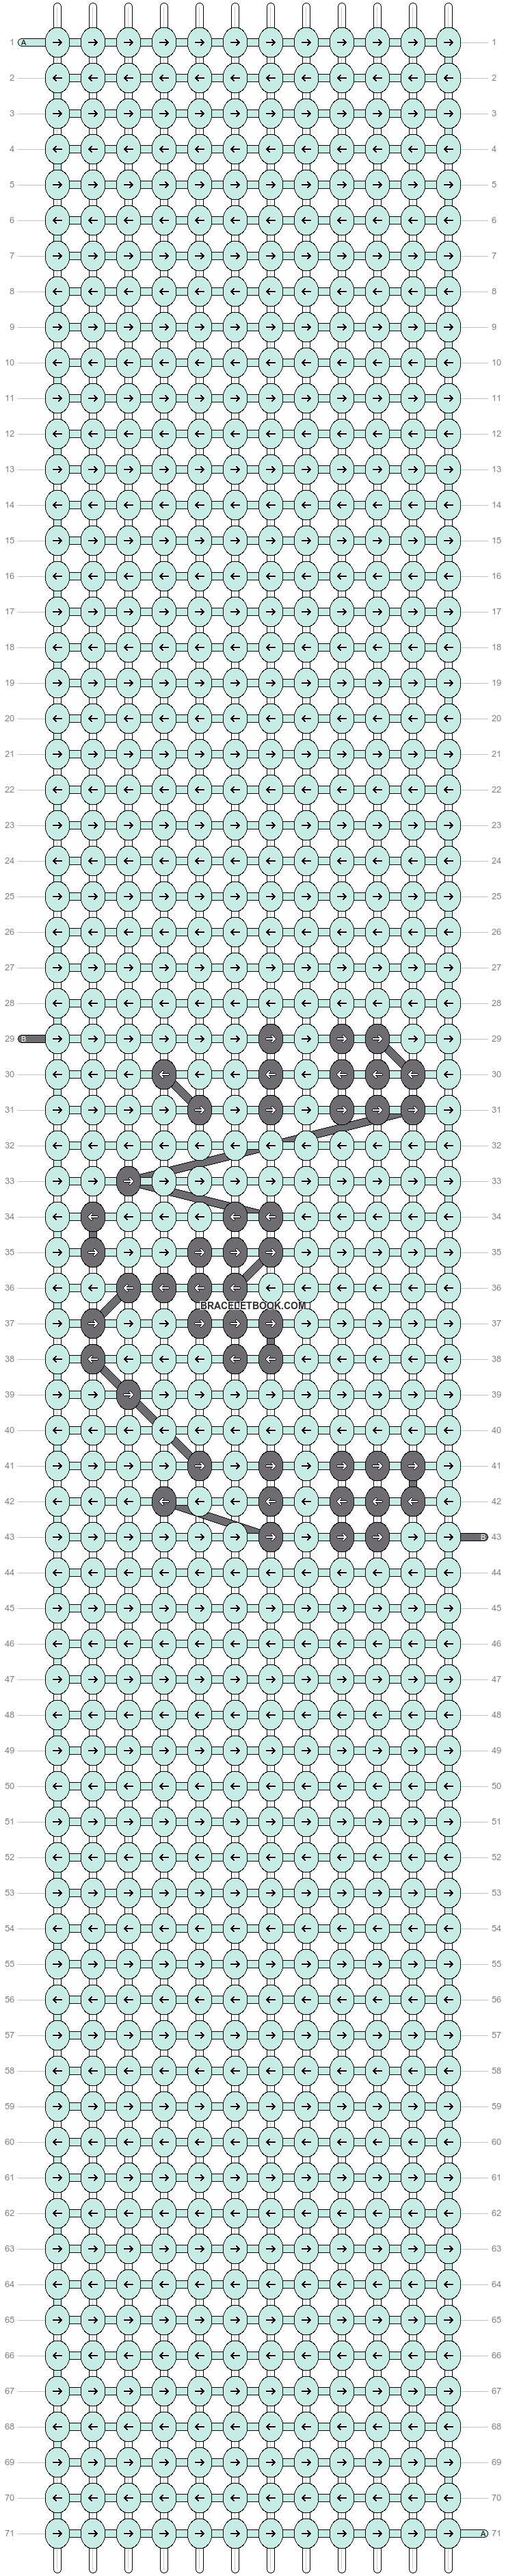 Alpha pattern #93056 pattern